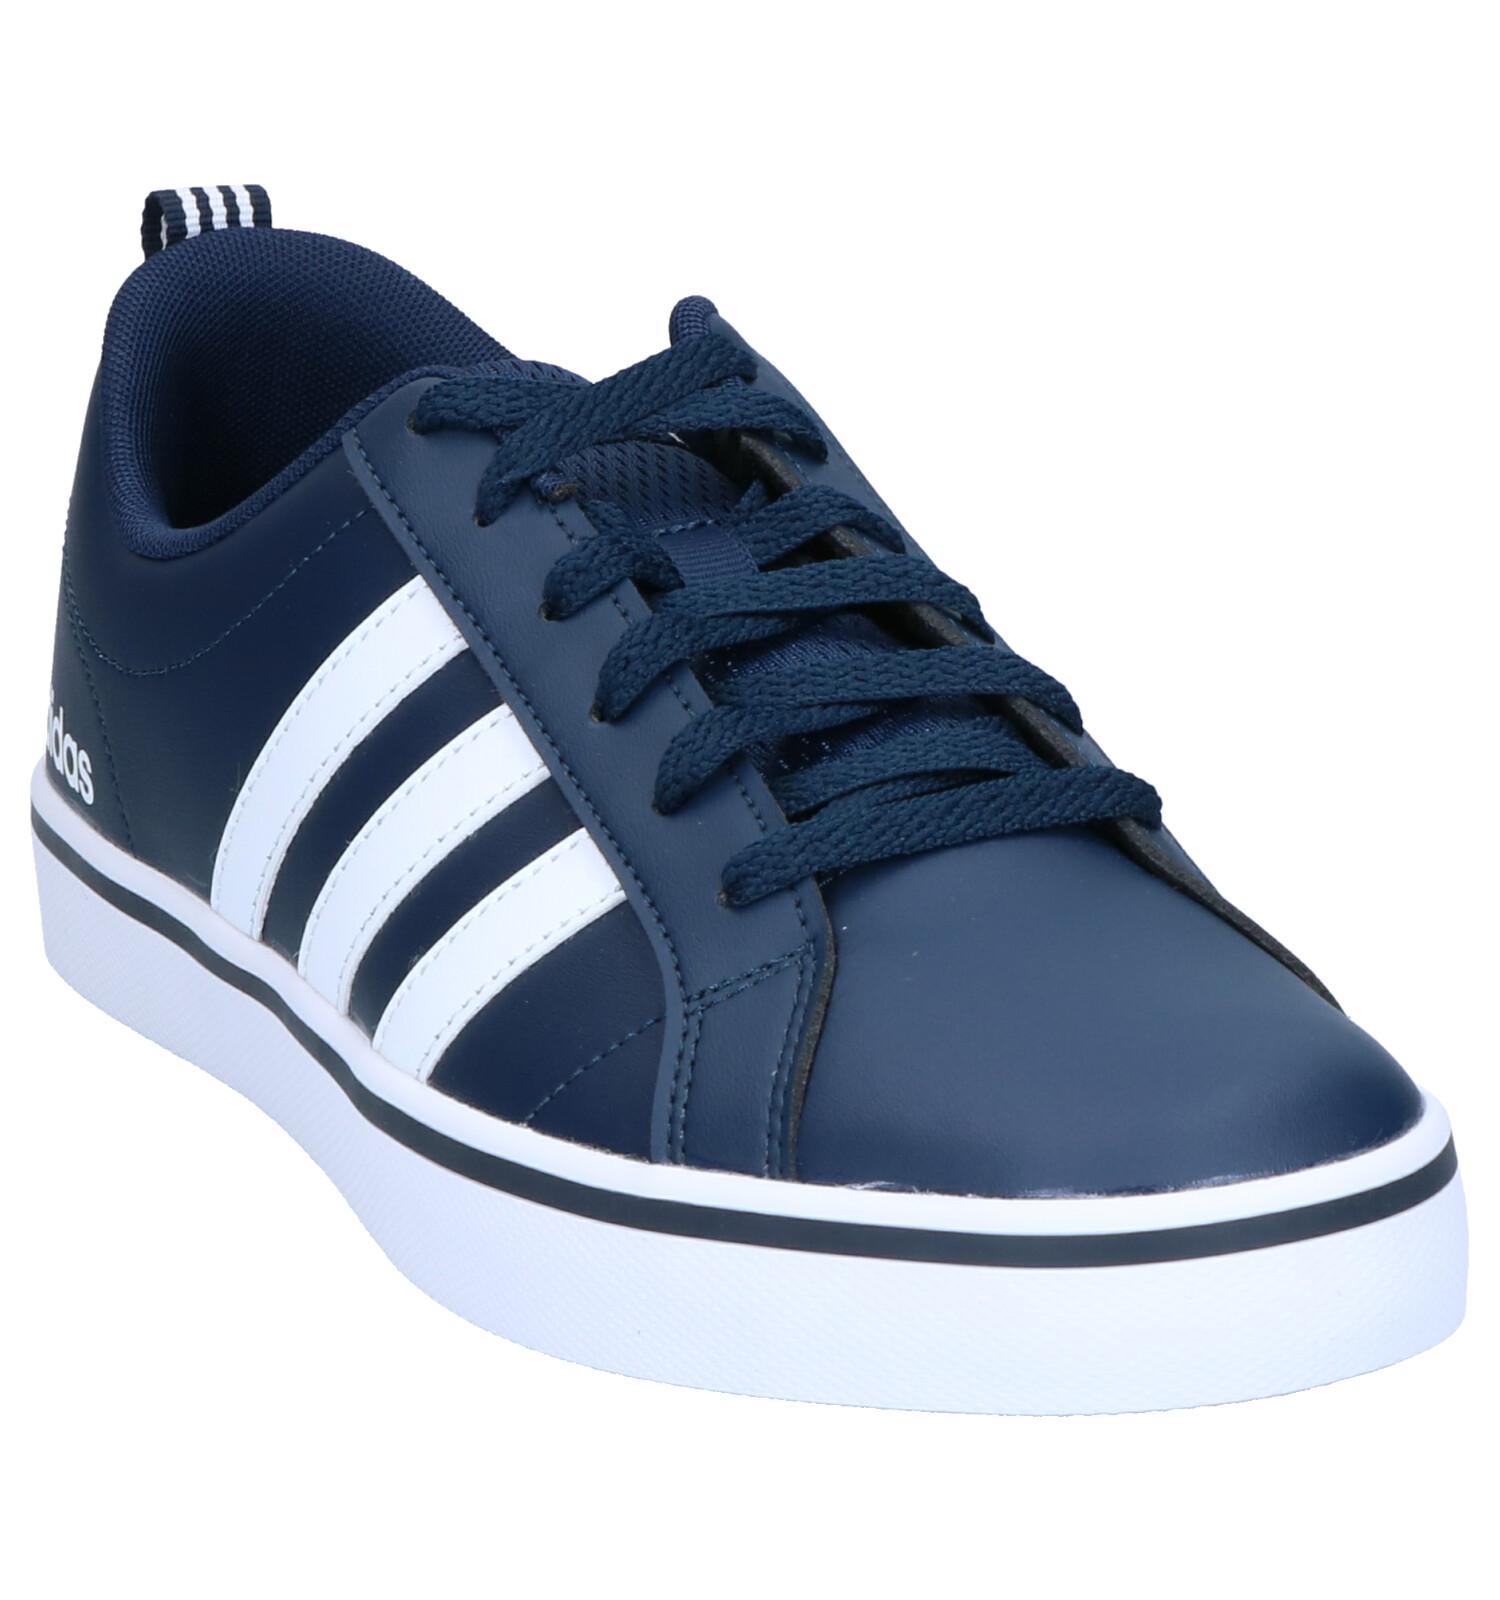 Donkerblauwe Sneakers Adidas VS Pace | TORFS.BE | Gratis